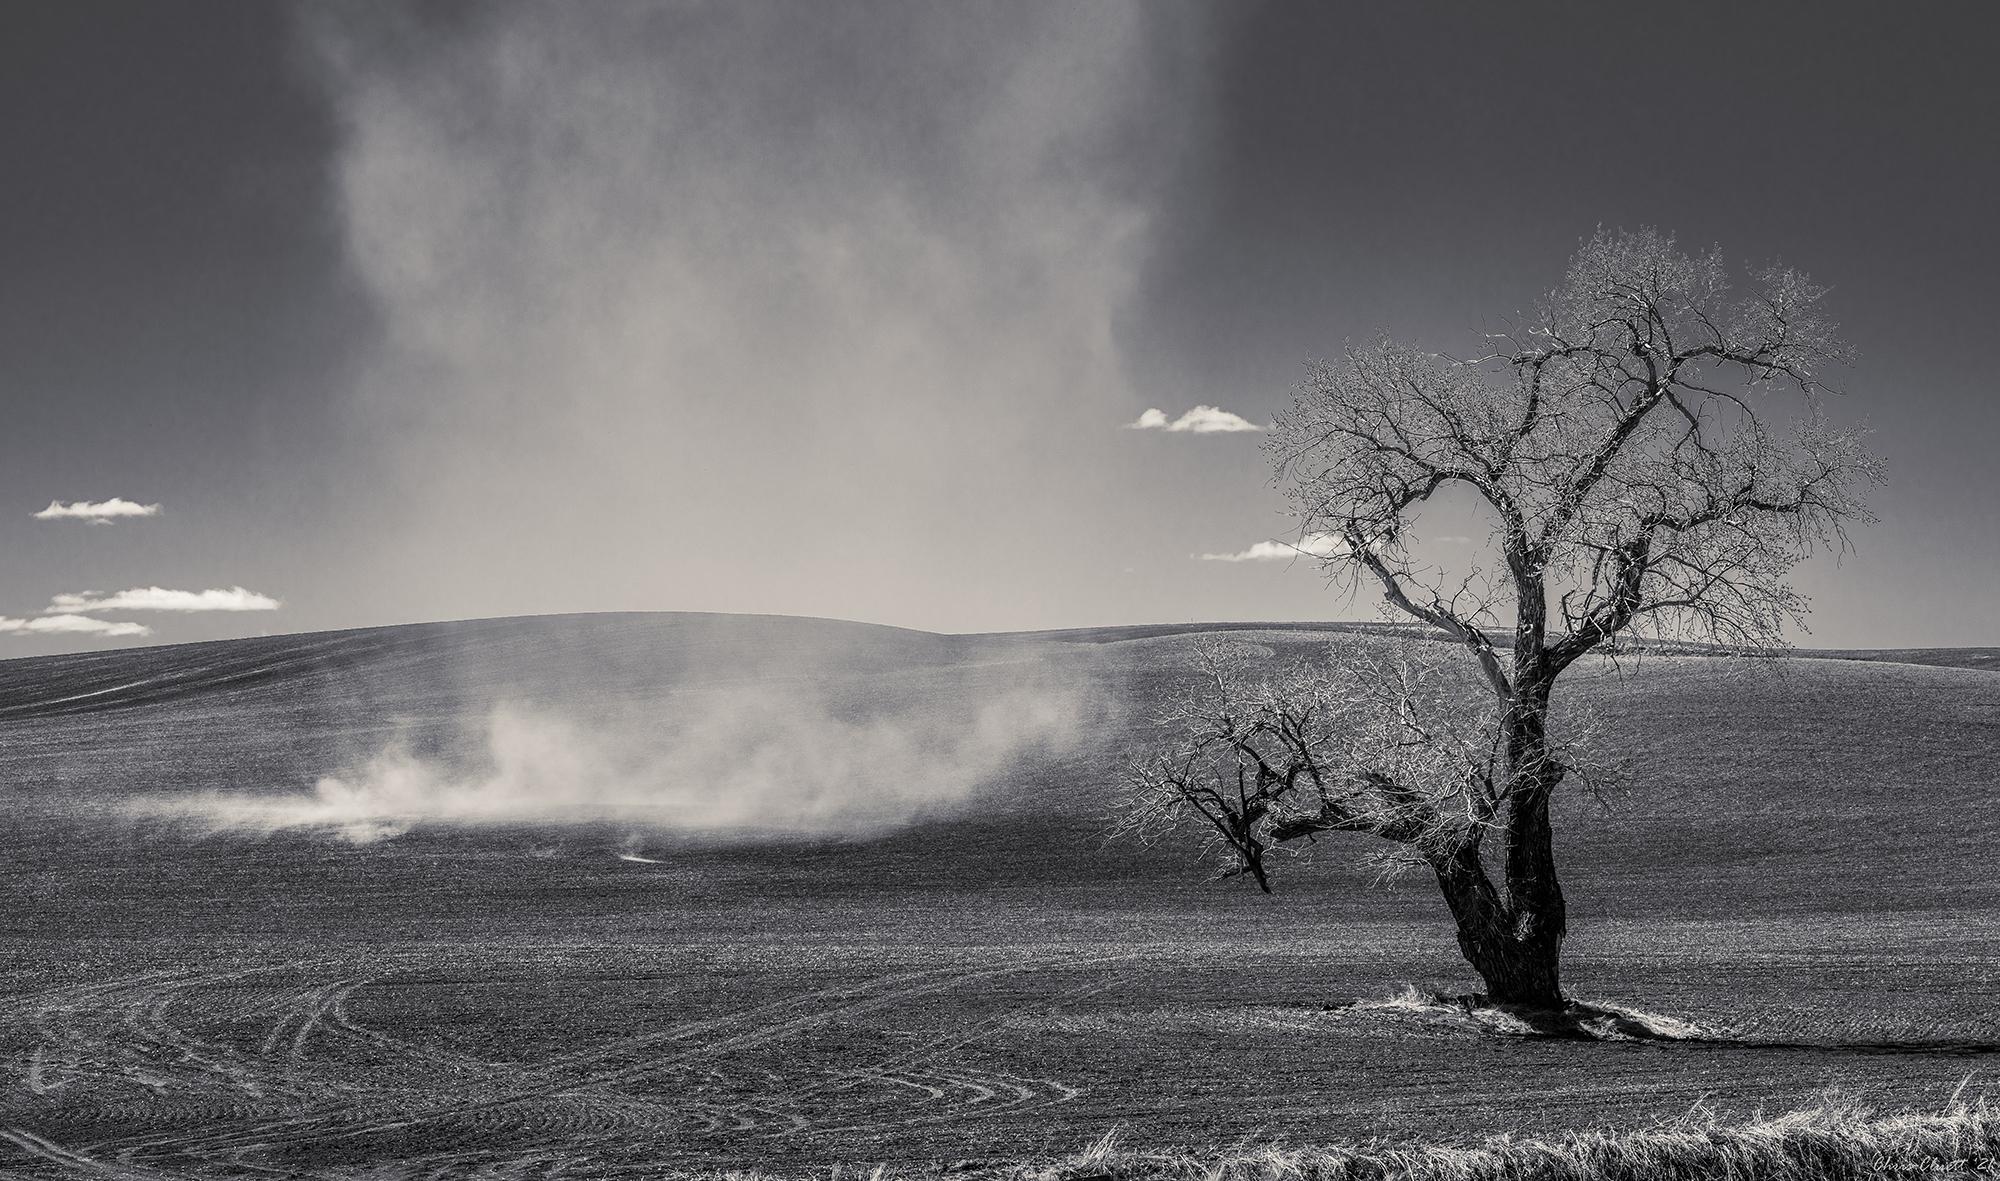 A dust devil blew spontaneously across this hillside.